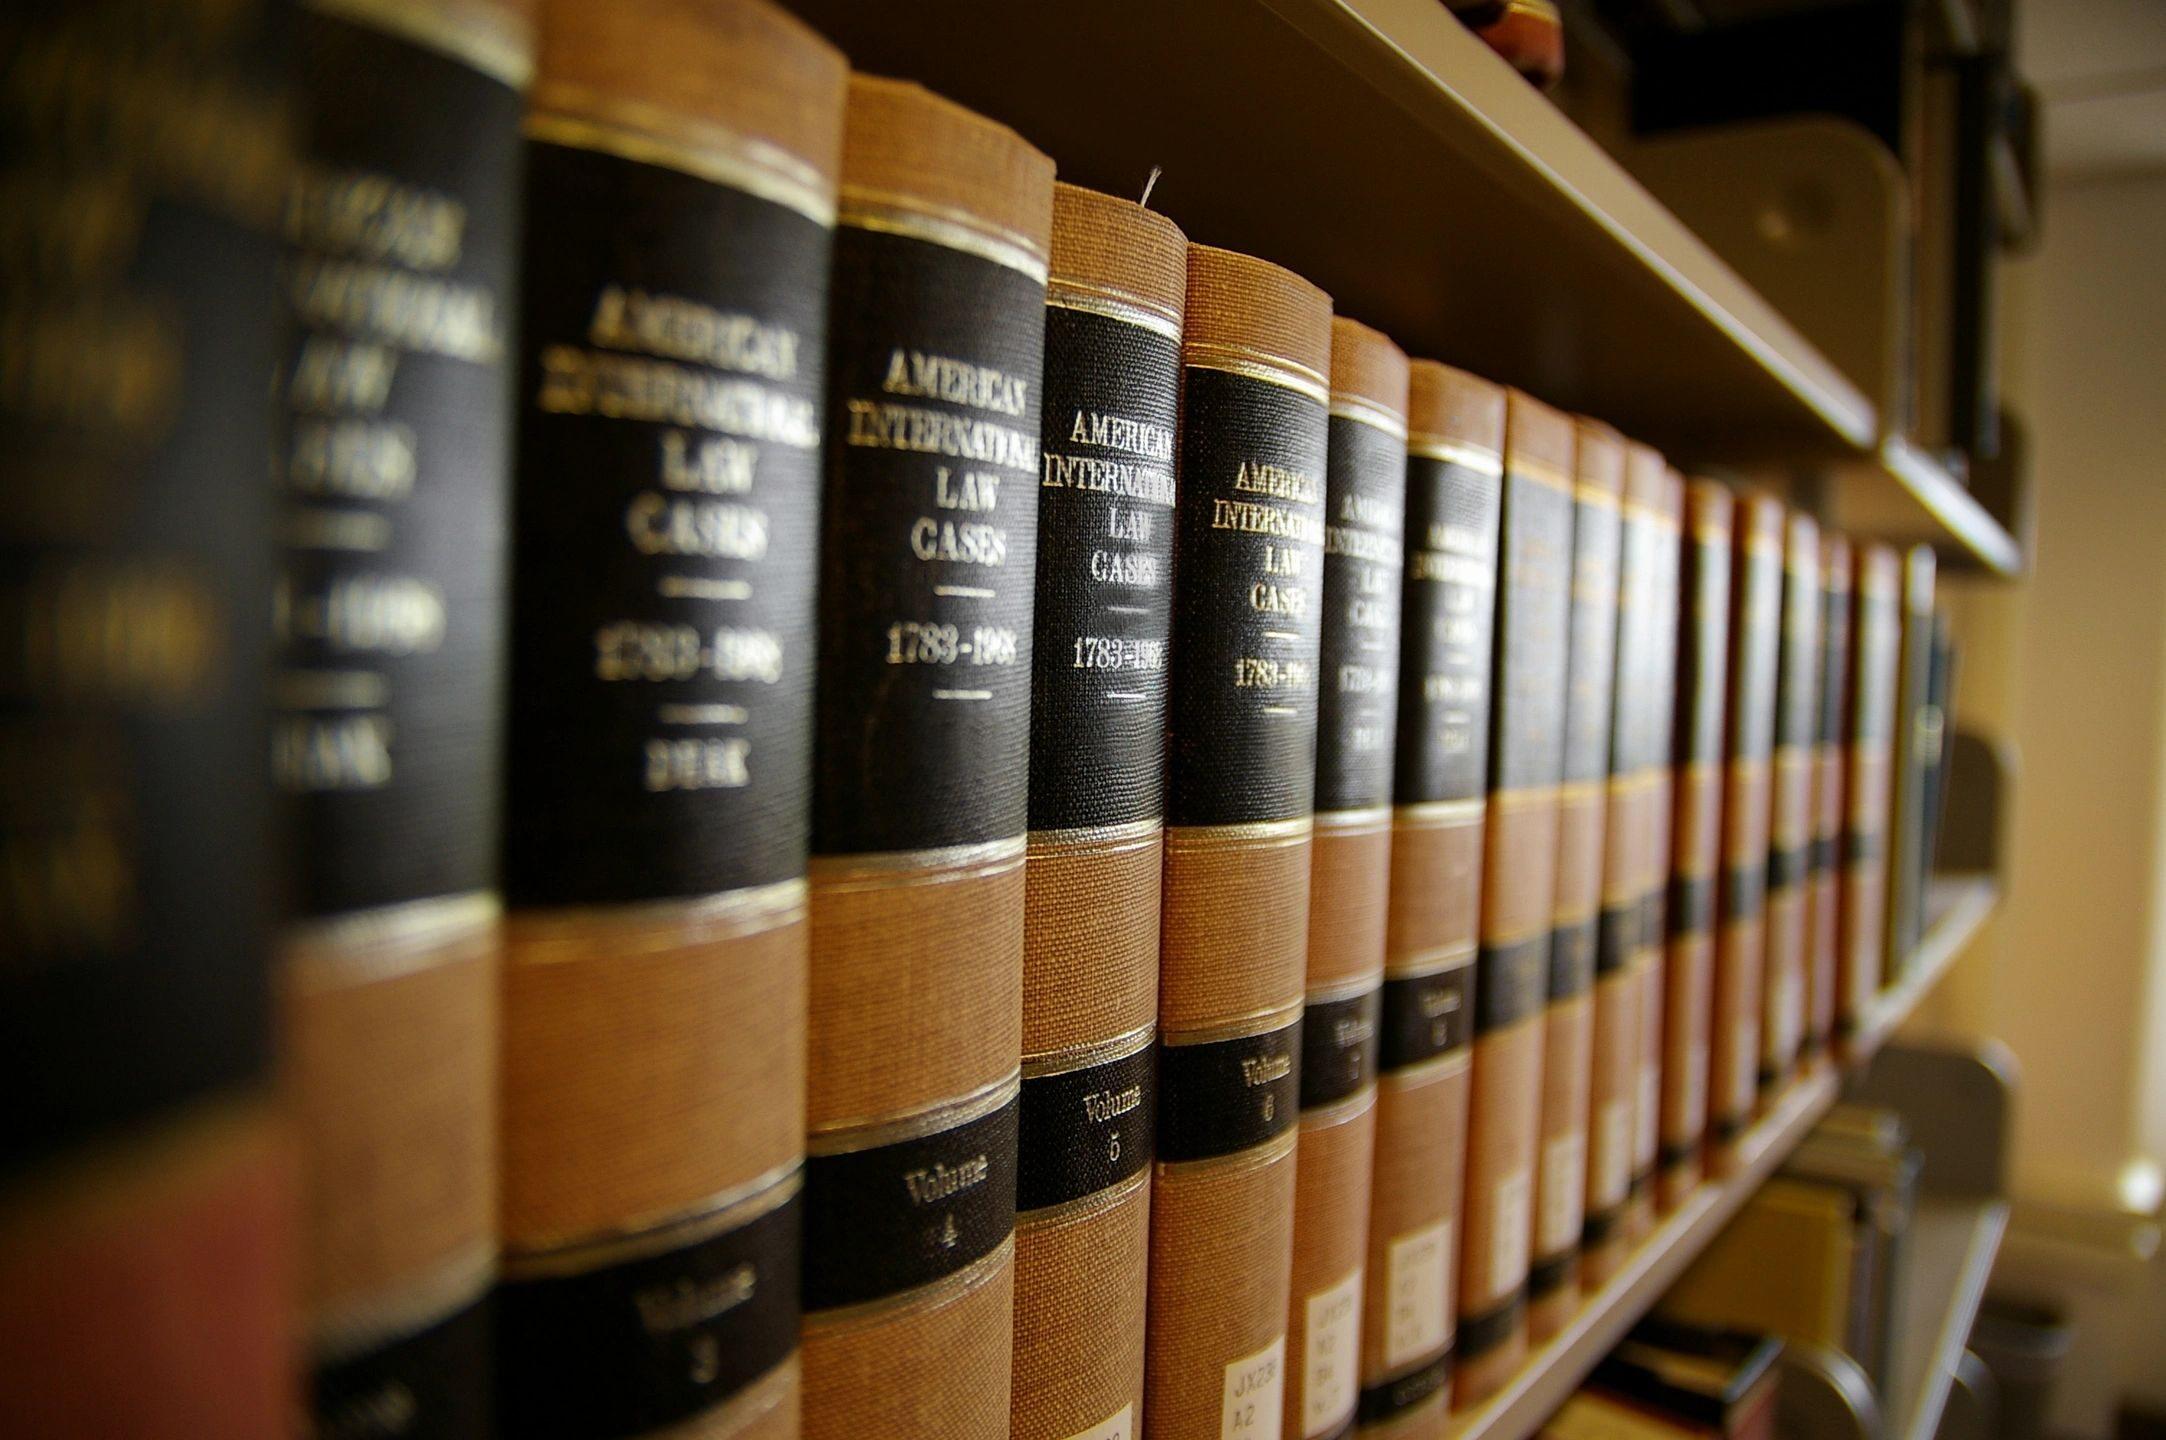 LAW OFFICE OF TIFFANY DUST